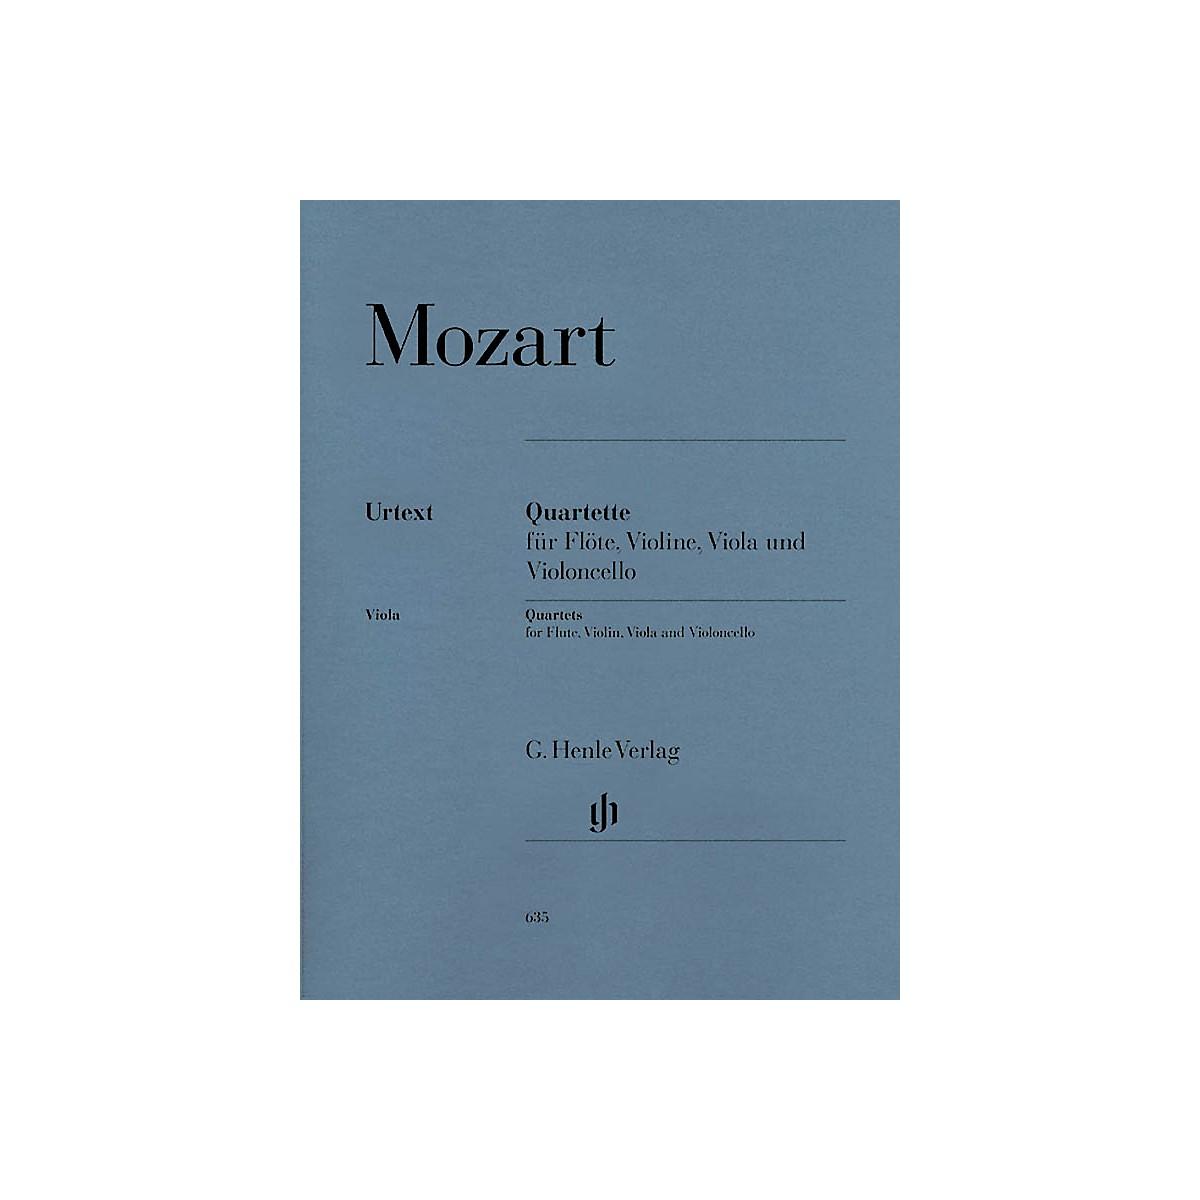 G. Henle Verlag Quartets for Flute, Violin, Viola, and Violoncello Henle Music by Wolfgang Amadeus Mozart